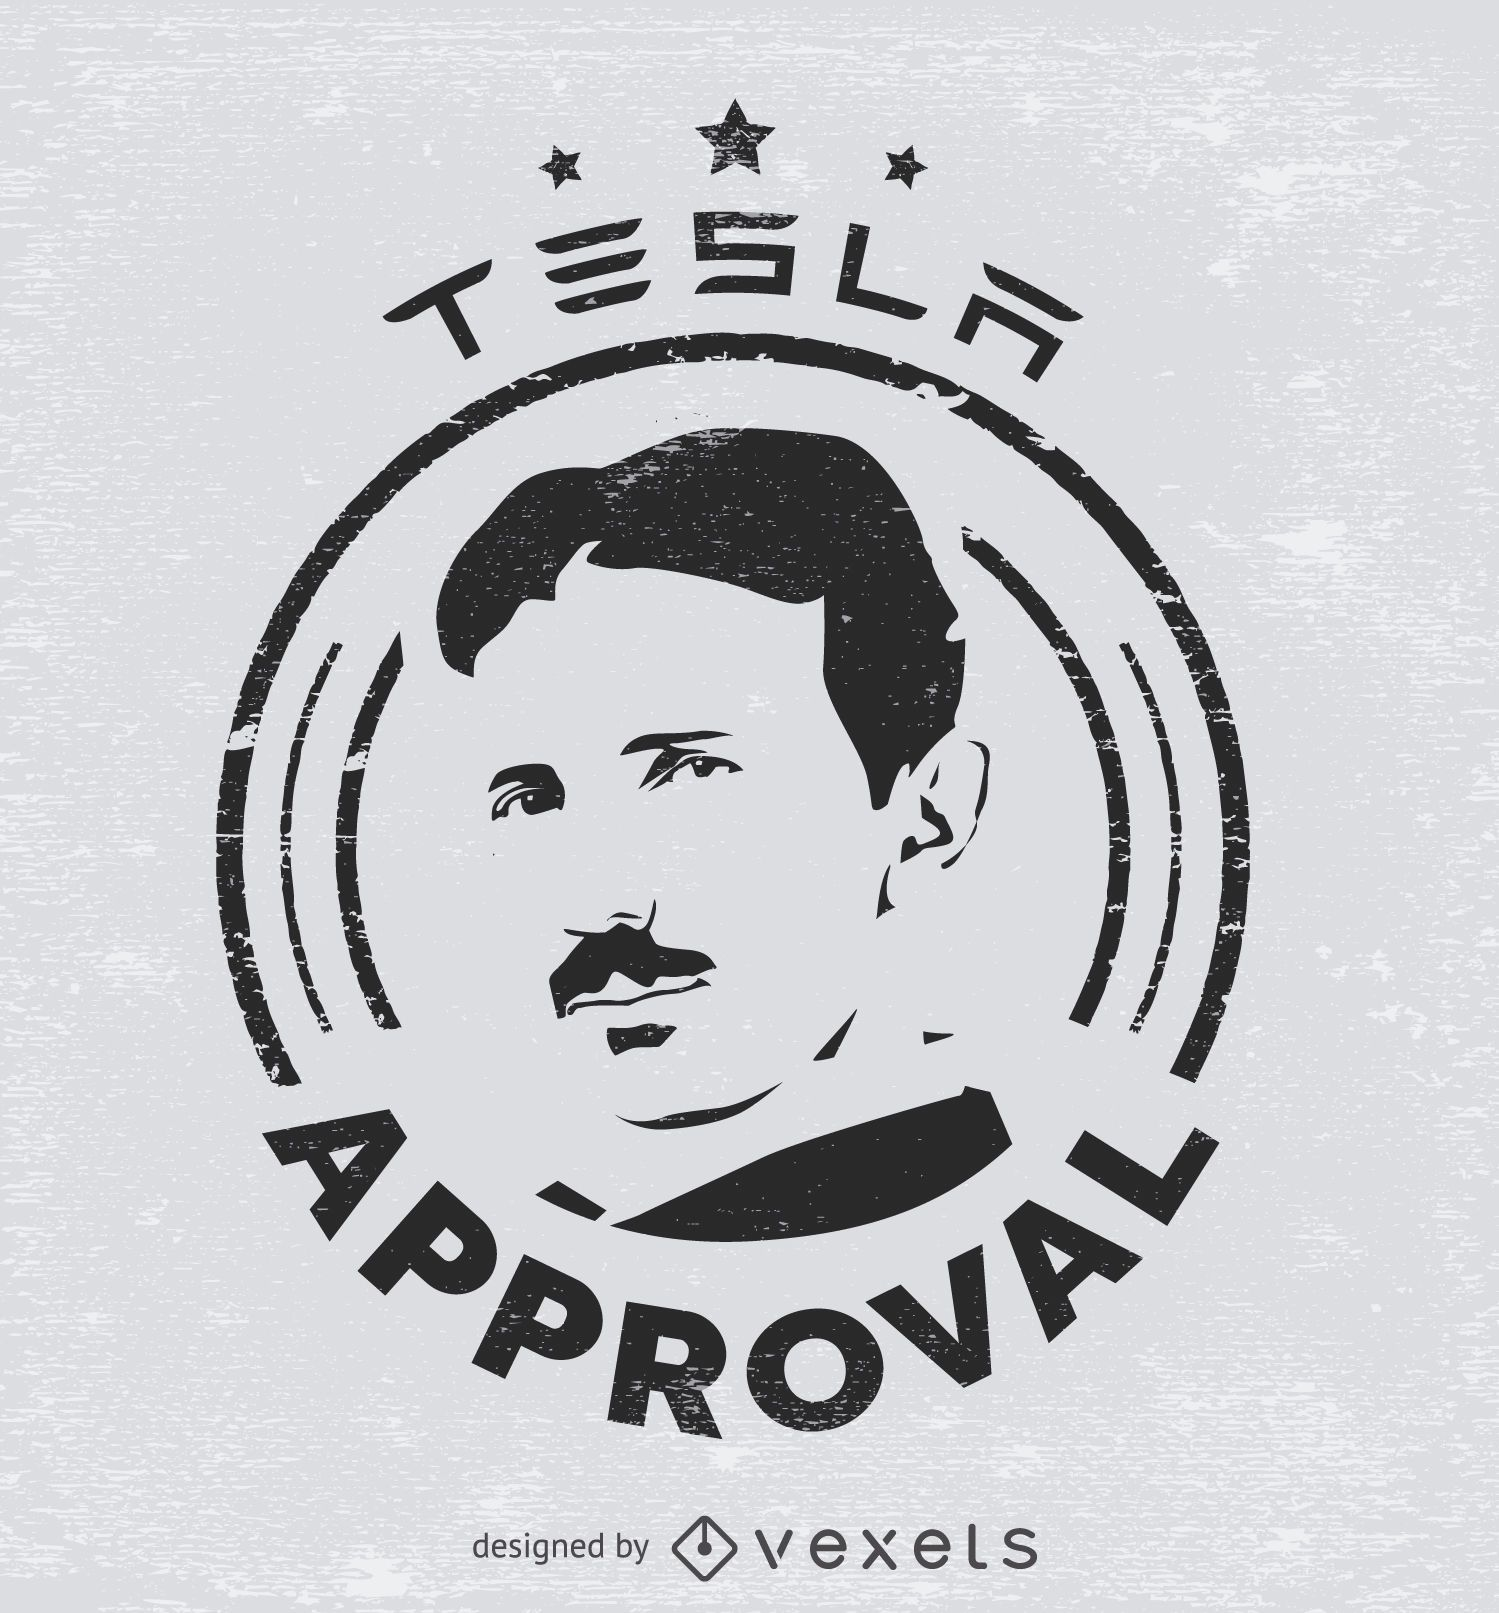 Tesla approval sticker